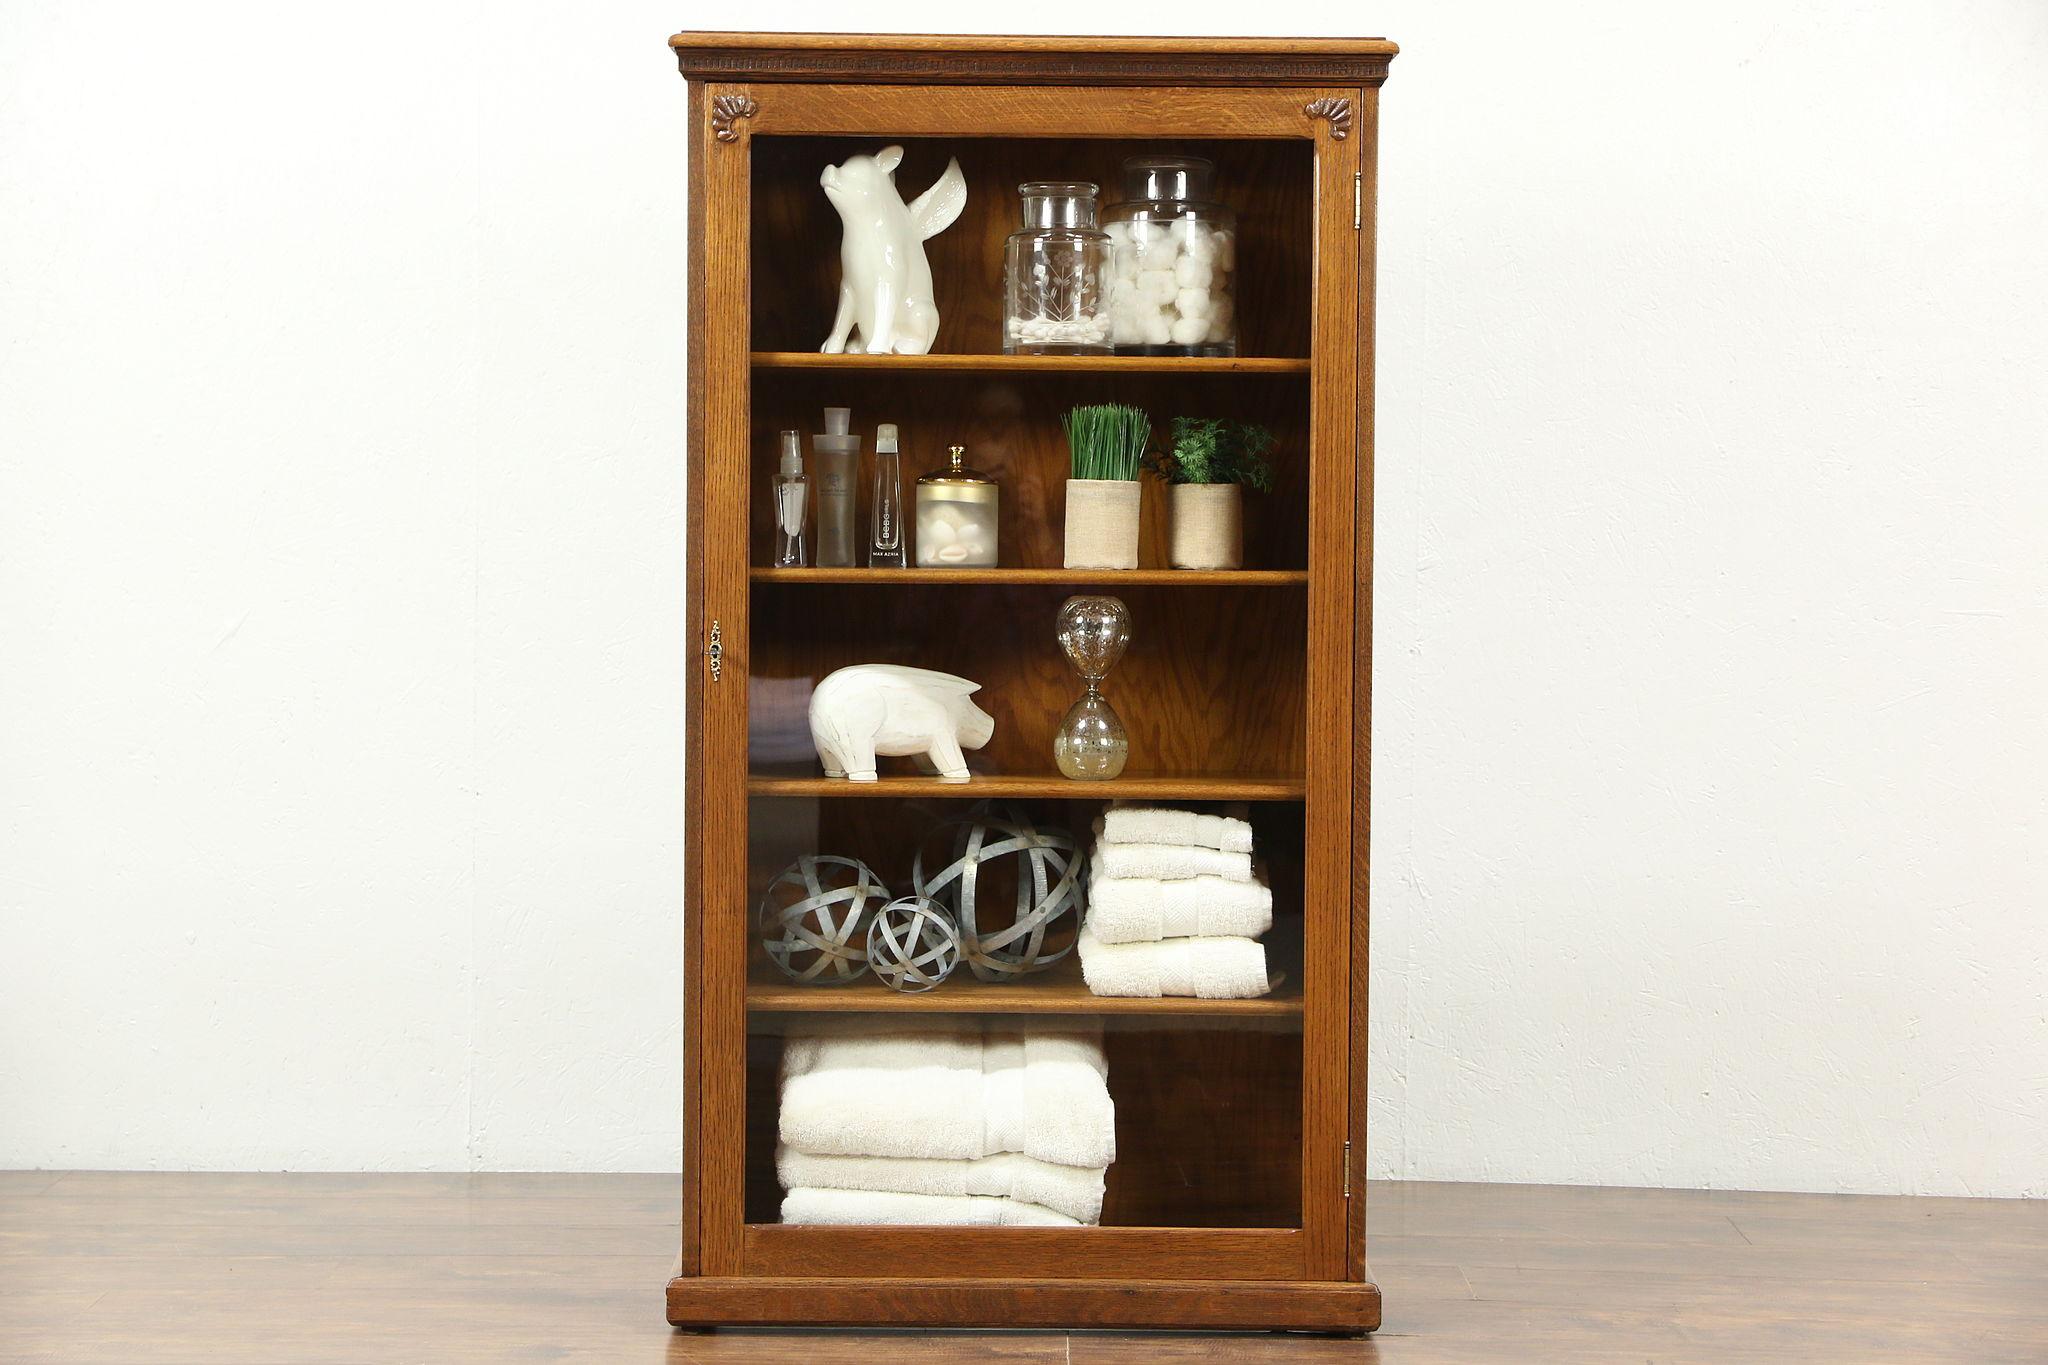 Victorian 1900 Antique Bookcase, Display Or Bathroom Cabinet